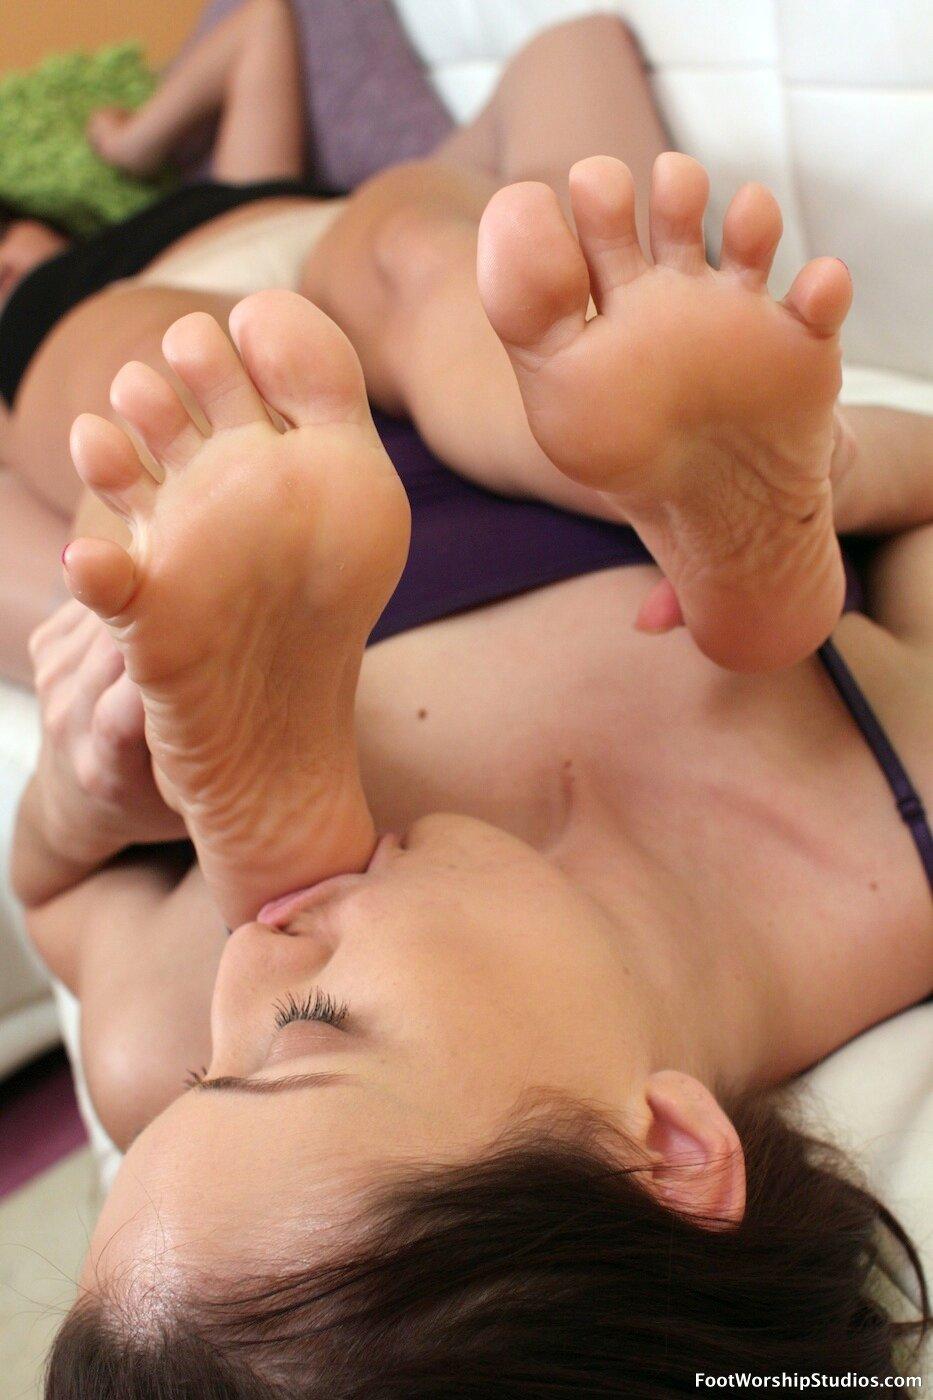 female-feet-lick-shree-j-wilson-nude-hd